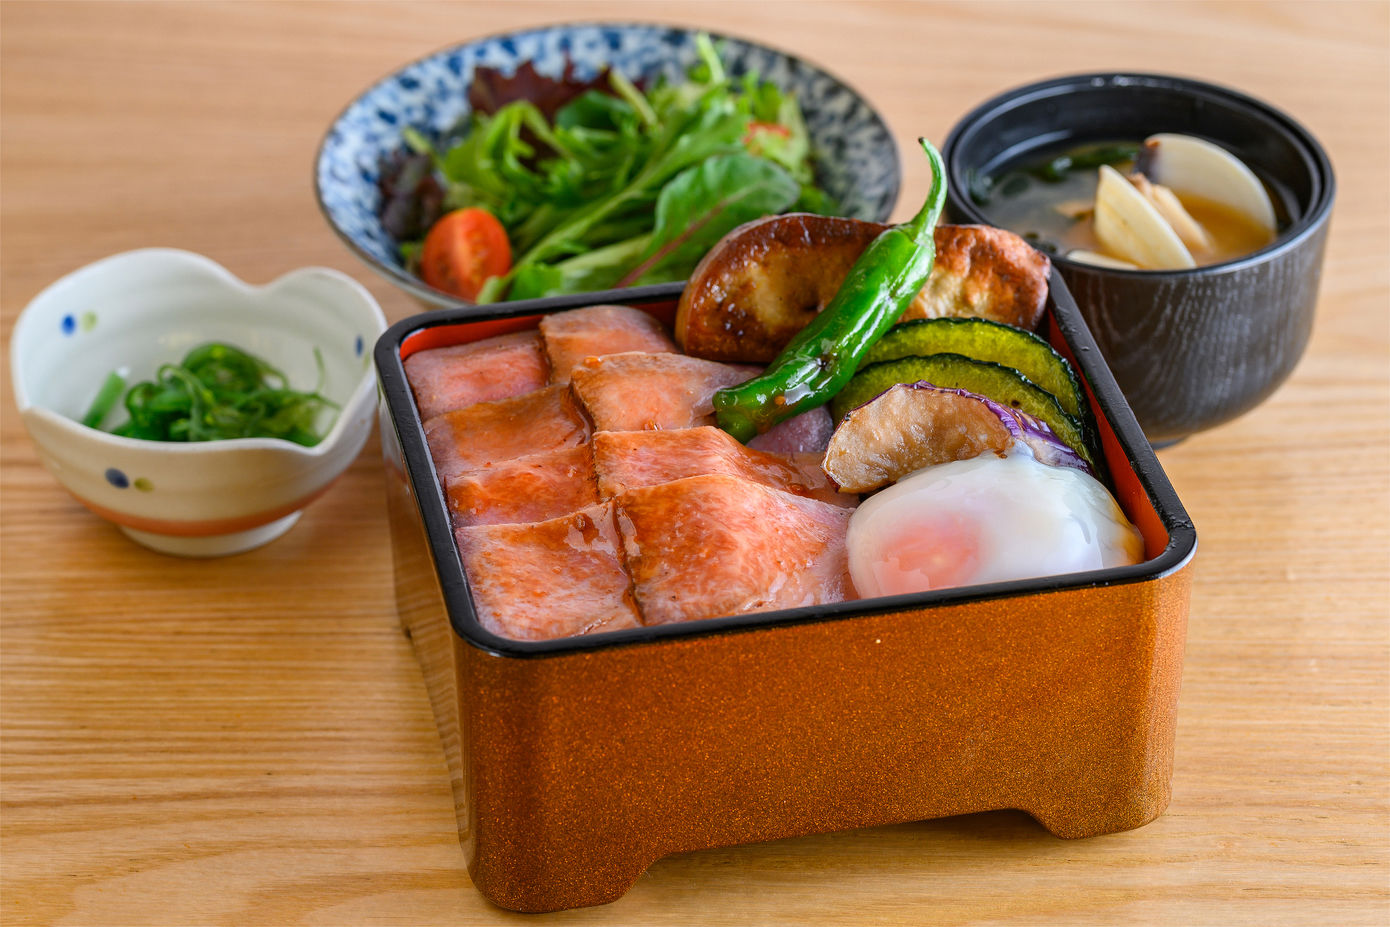 En-Dining-Miyazaki-Wagyu-Yakiniku - THE EDGE SINGAPORE